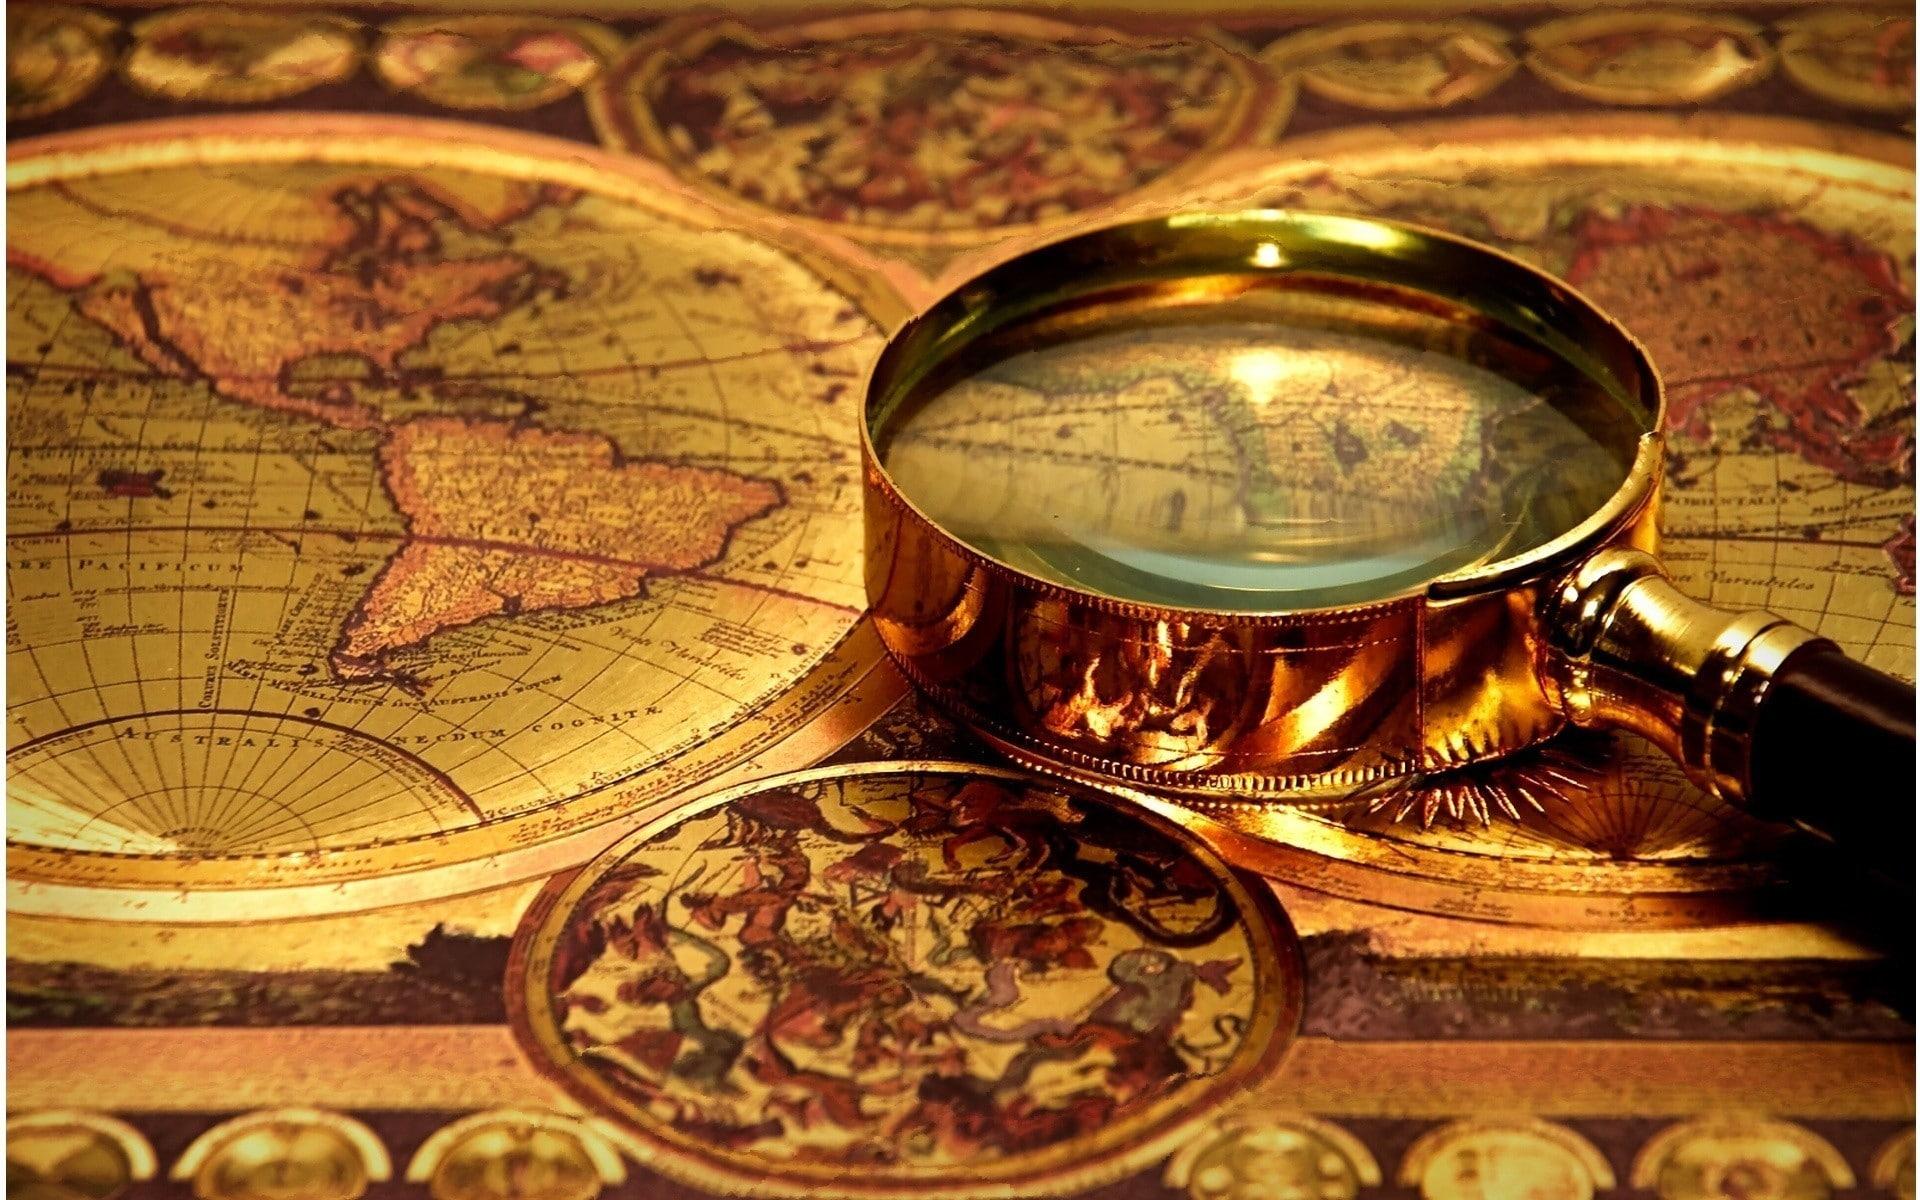 HD wallpaper: map magnifying glasses vintage, finance, close.